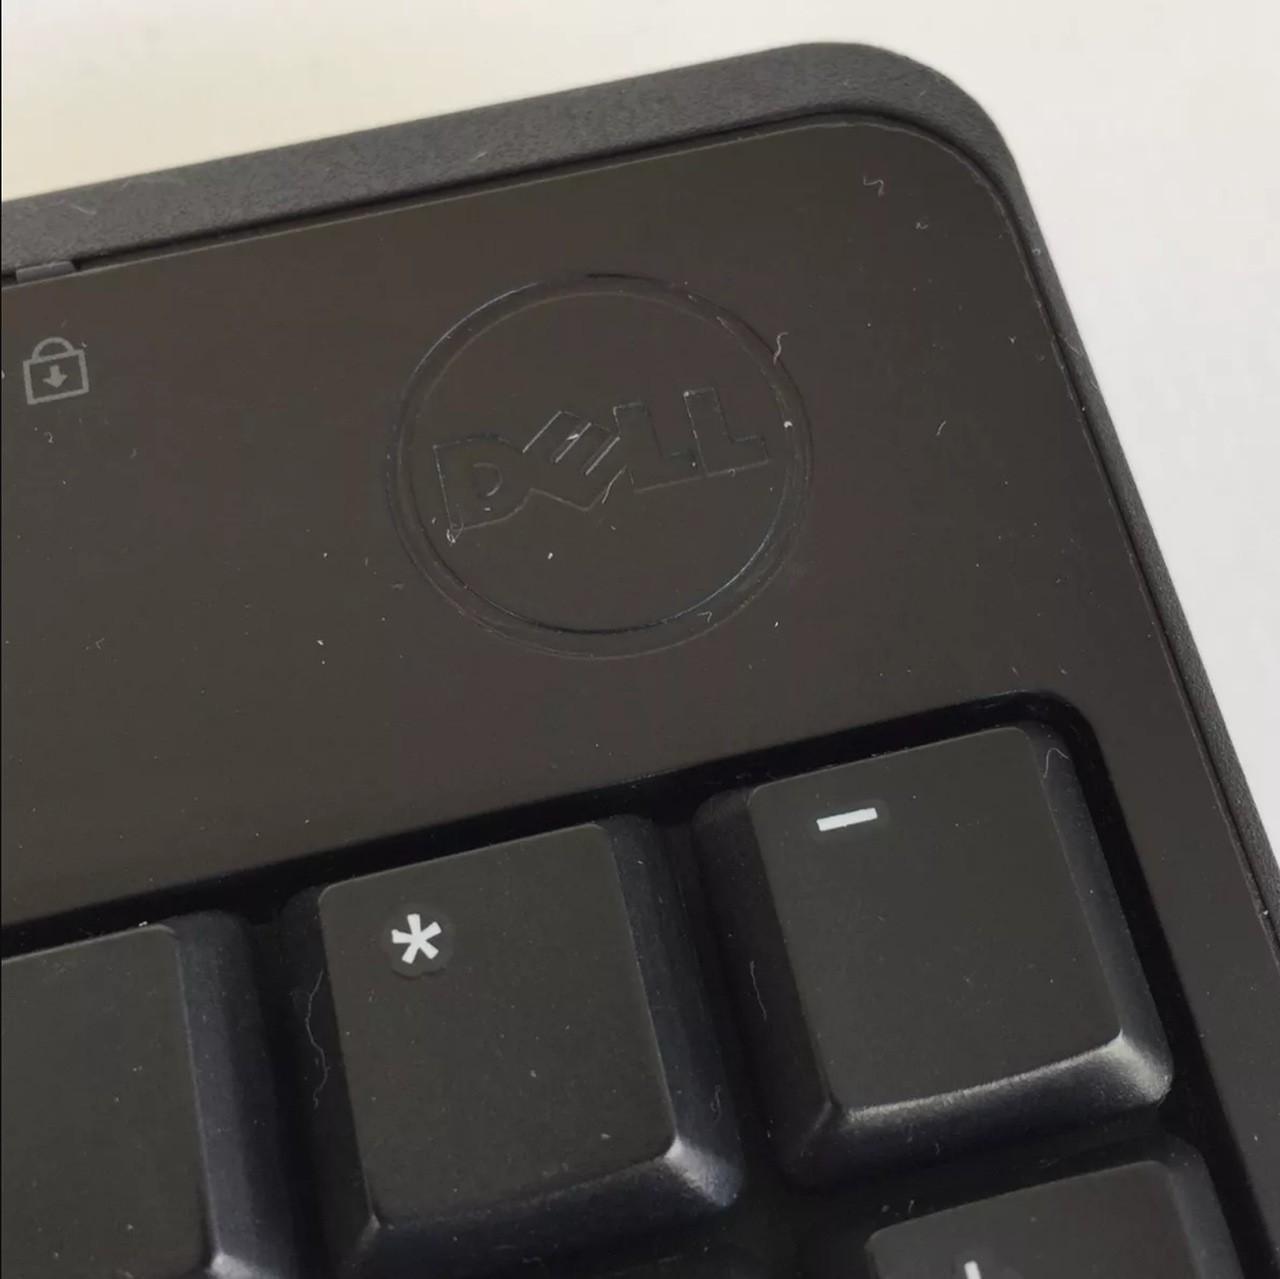 Teclado Dell Abnt 2 Com Ç - Usb Com Fio Kb 212-b Preto